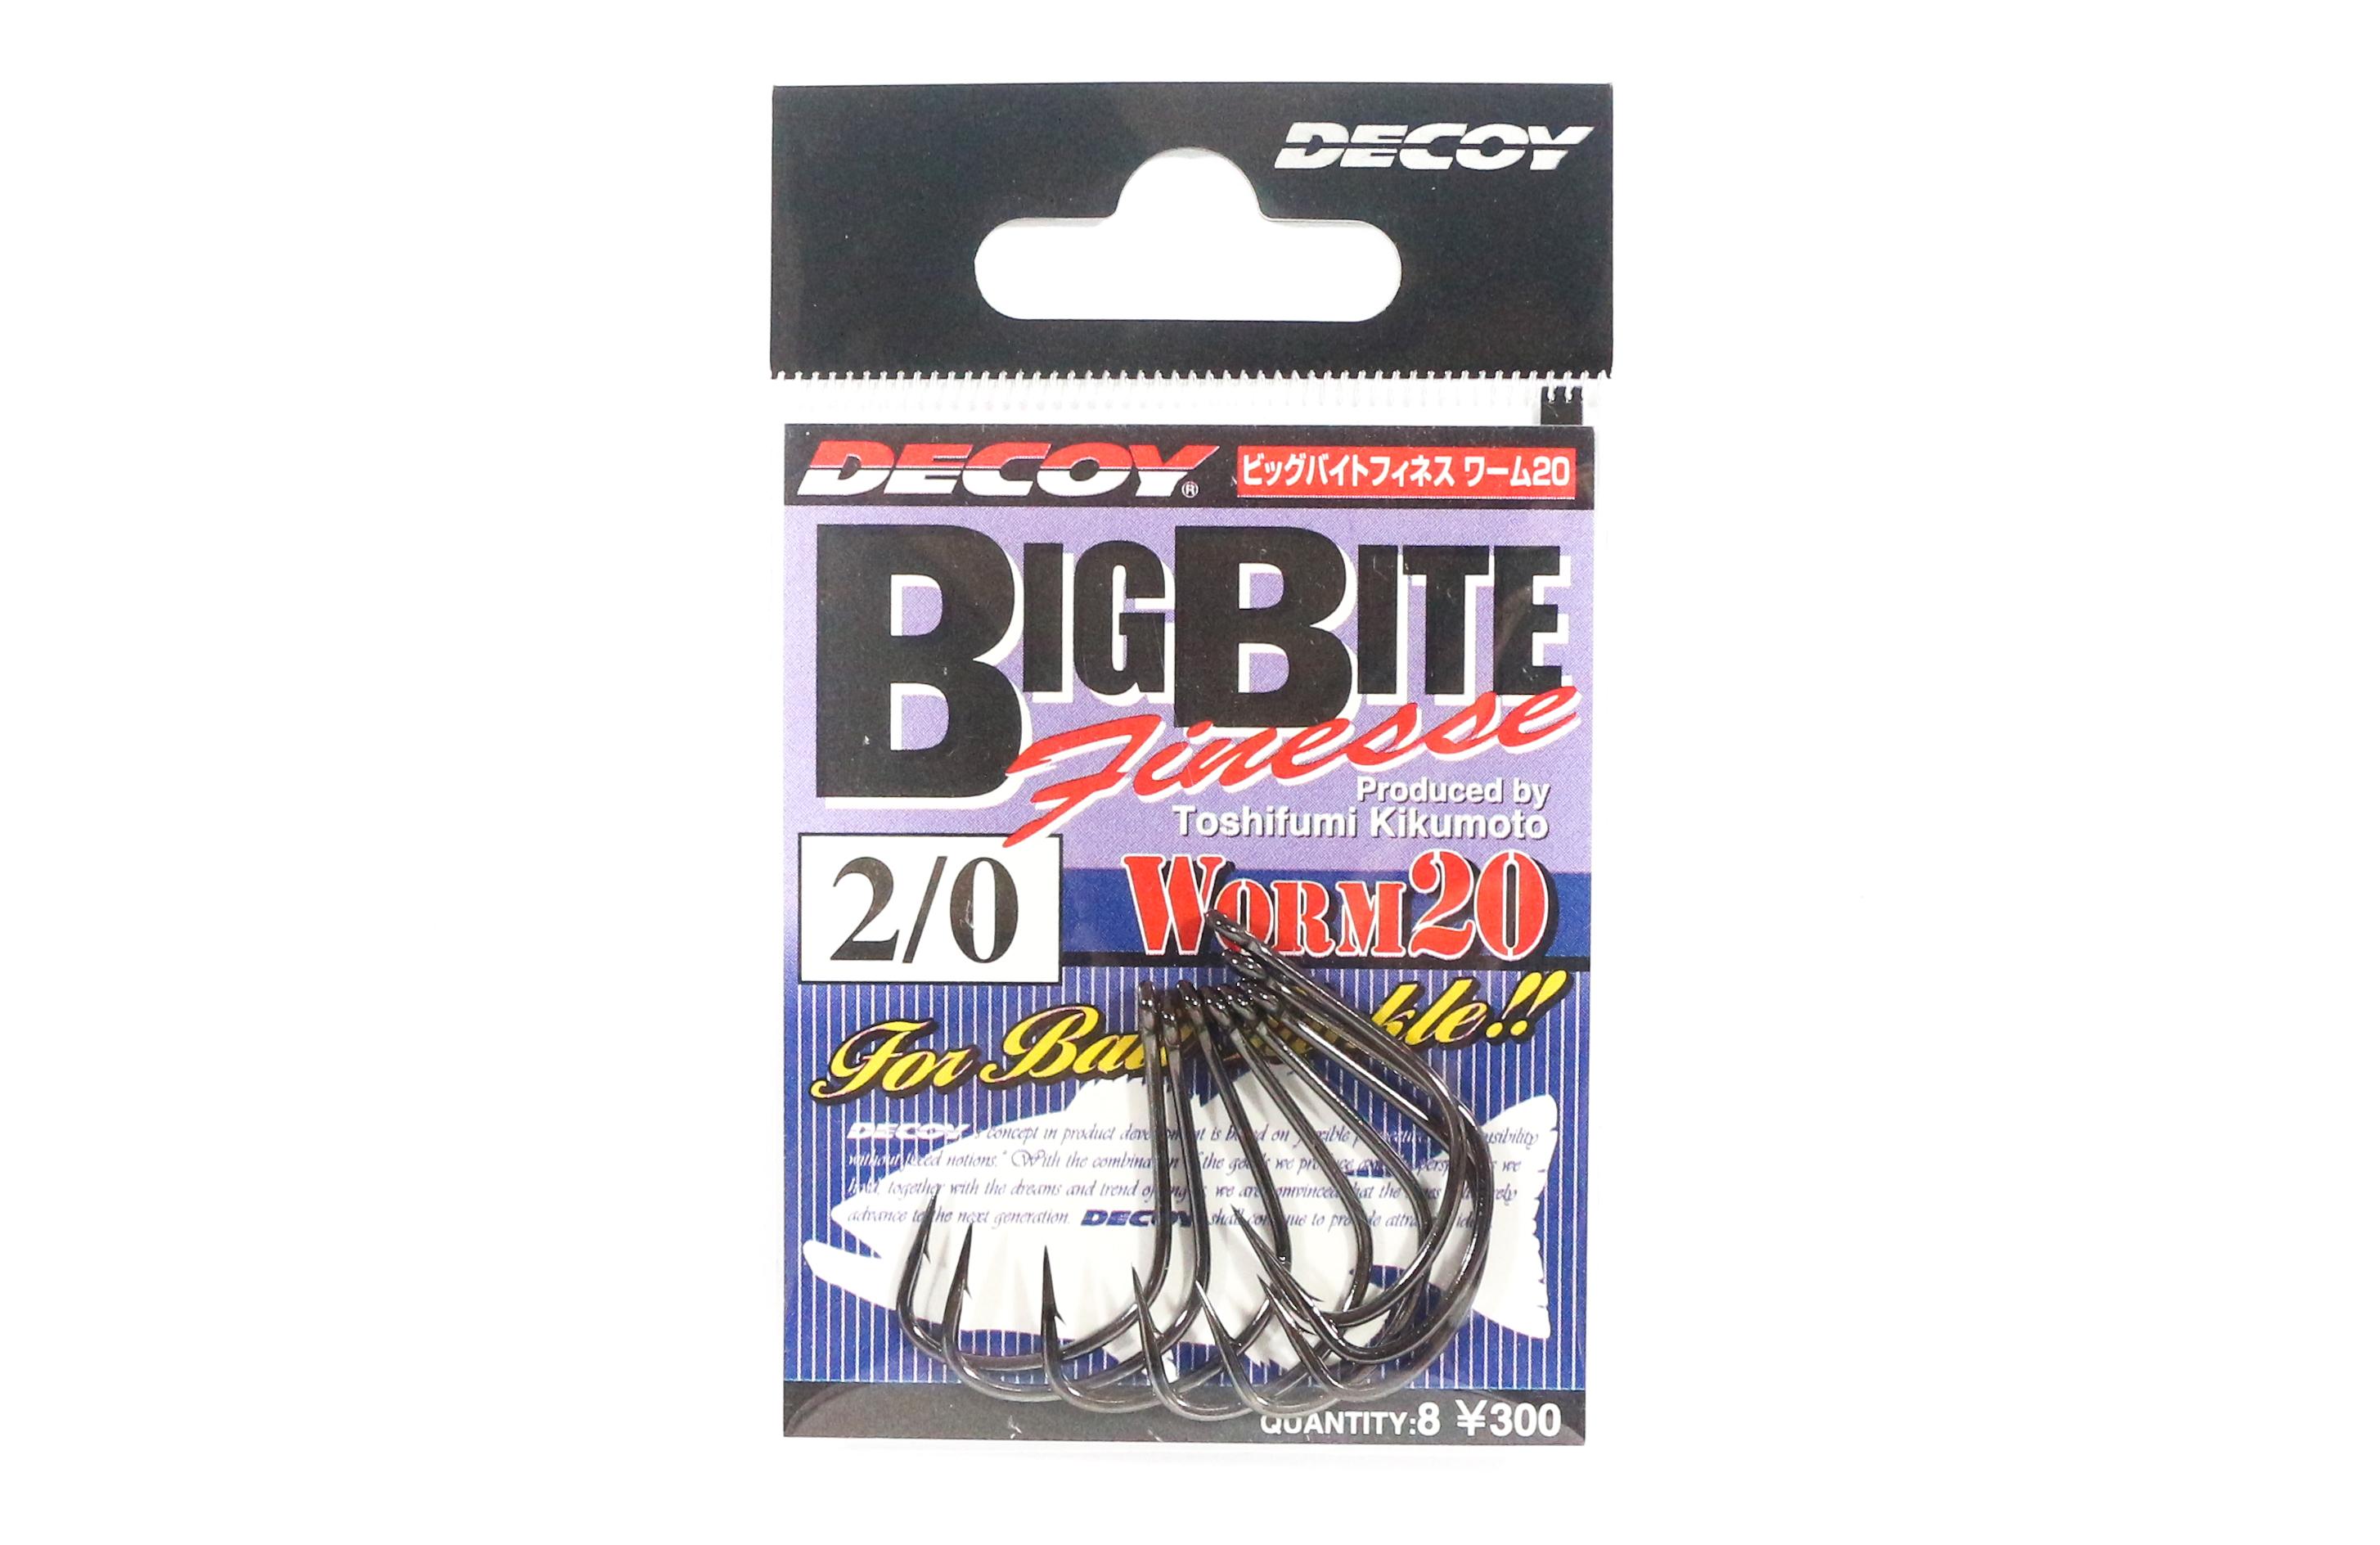 Decoy Worm 20 Big Bite Finesse Wide Gap Hooks Size 2/0 (2938)